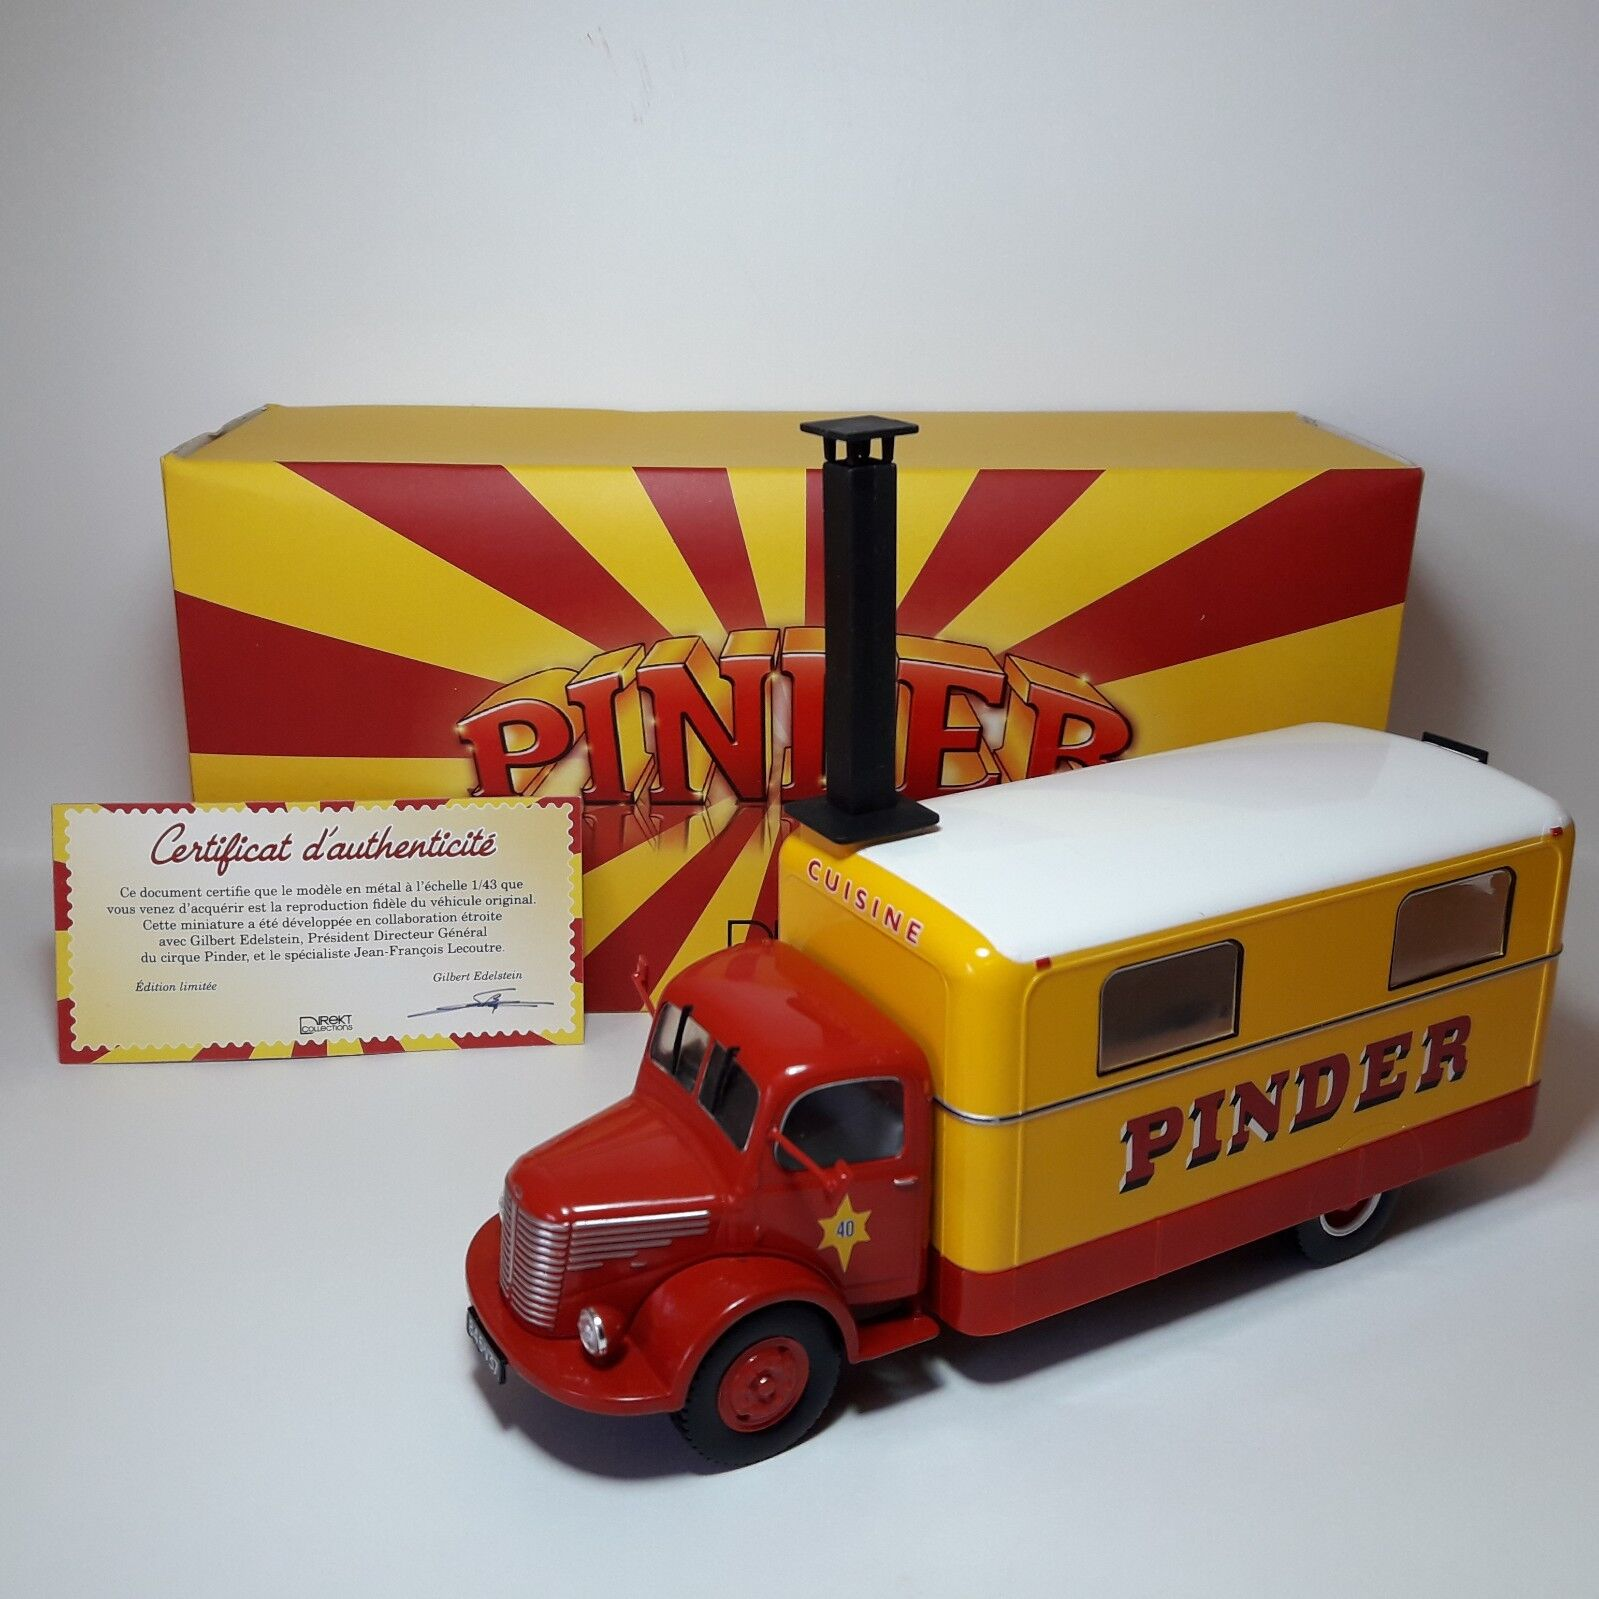 1/43 EXT64 CAMION TRUCK UNIC CIRCO PINDER CUISINE COCINA 1952